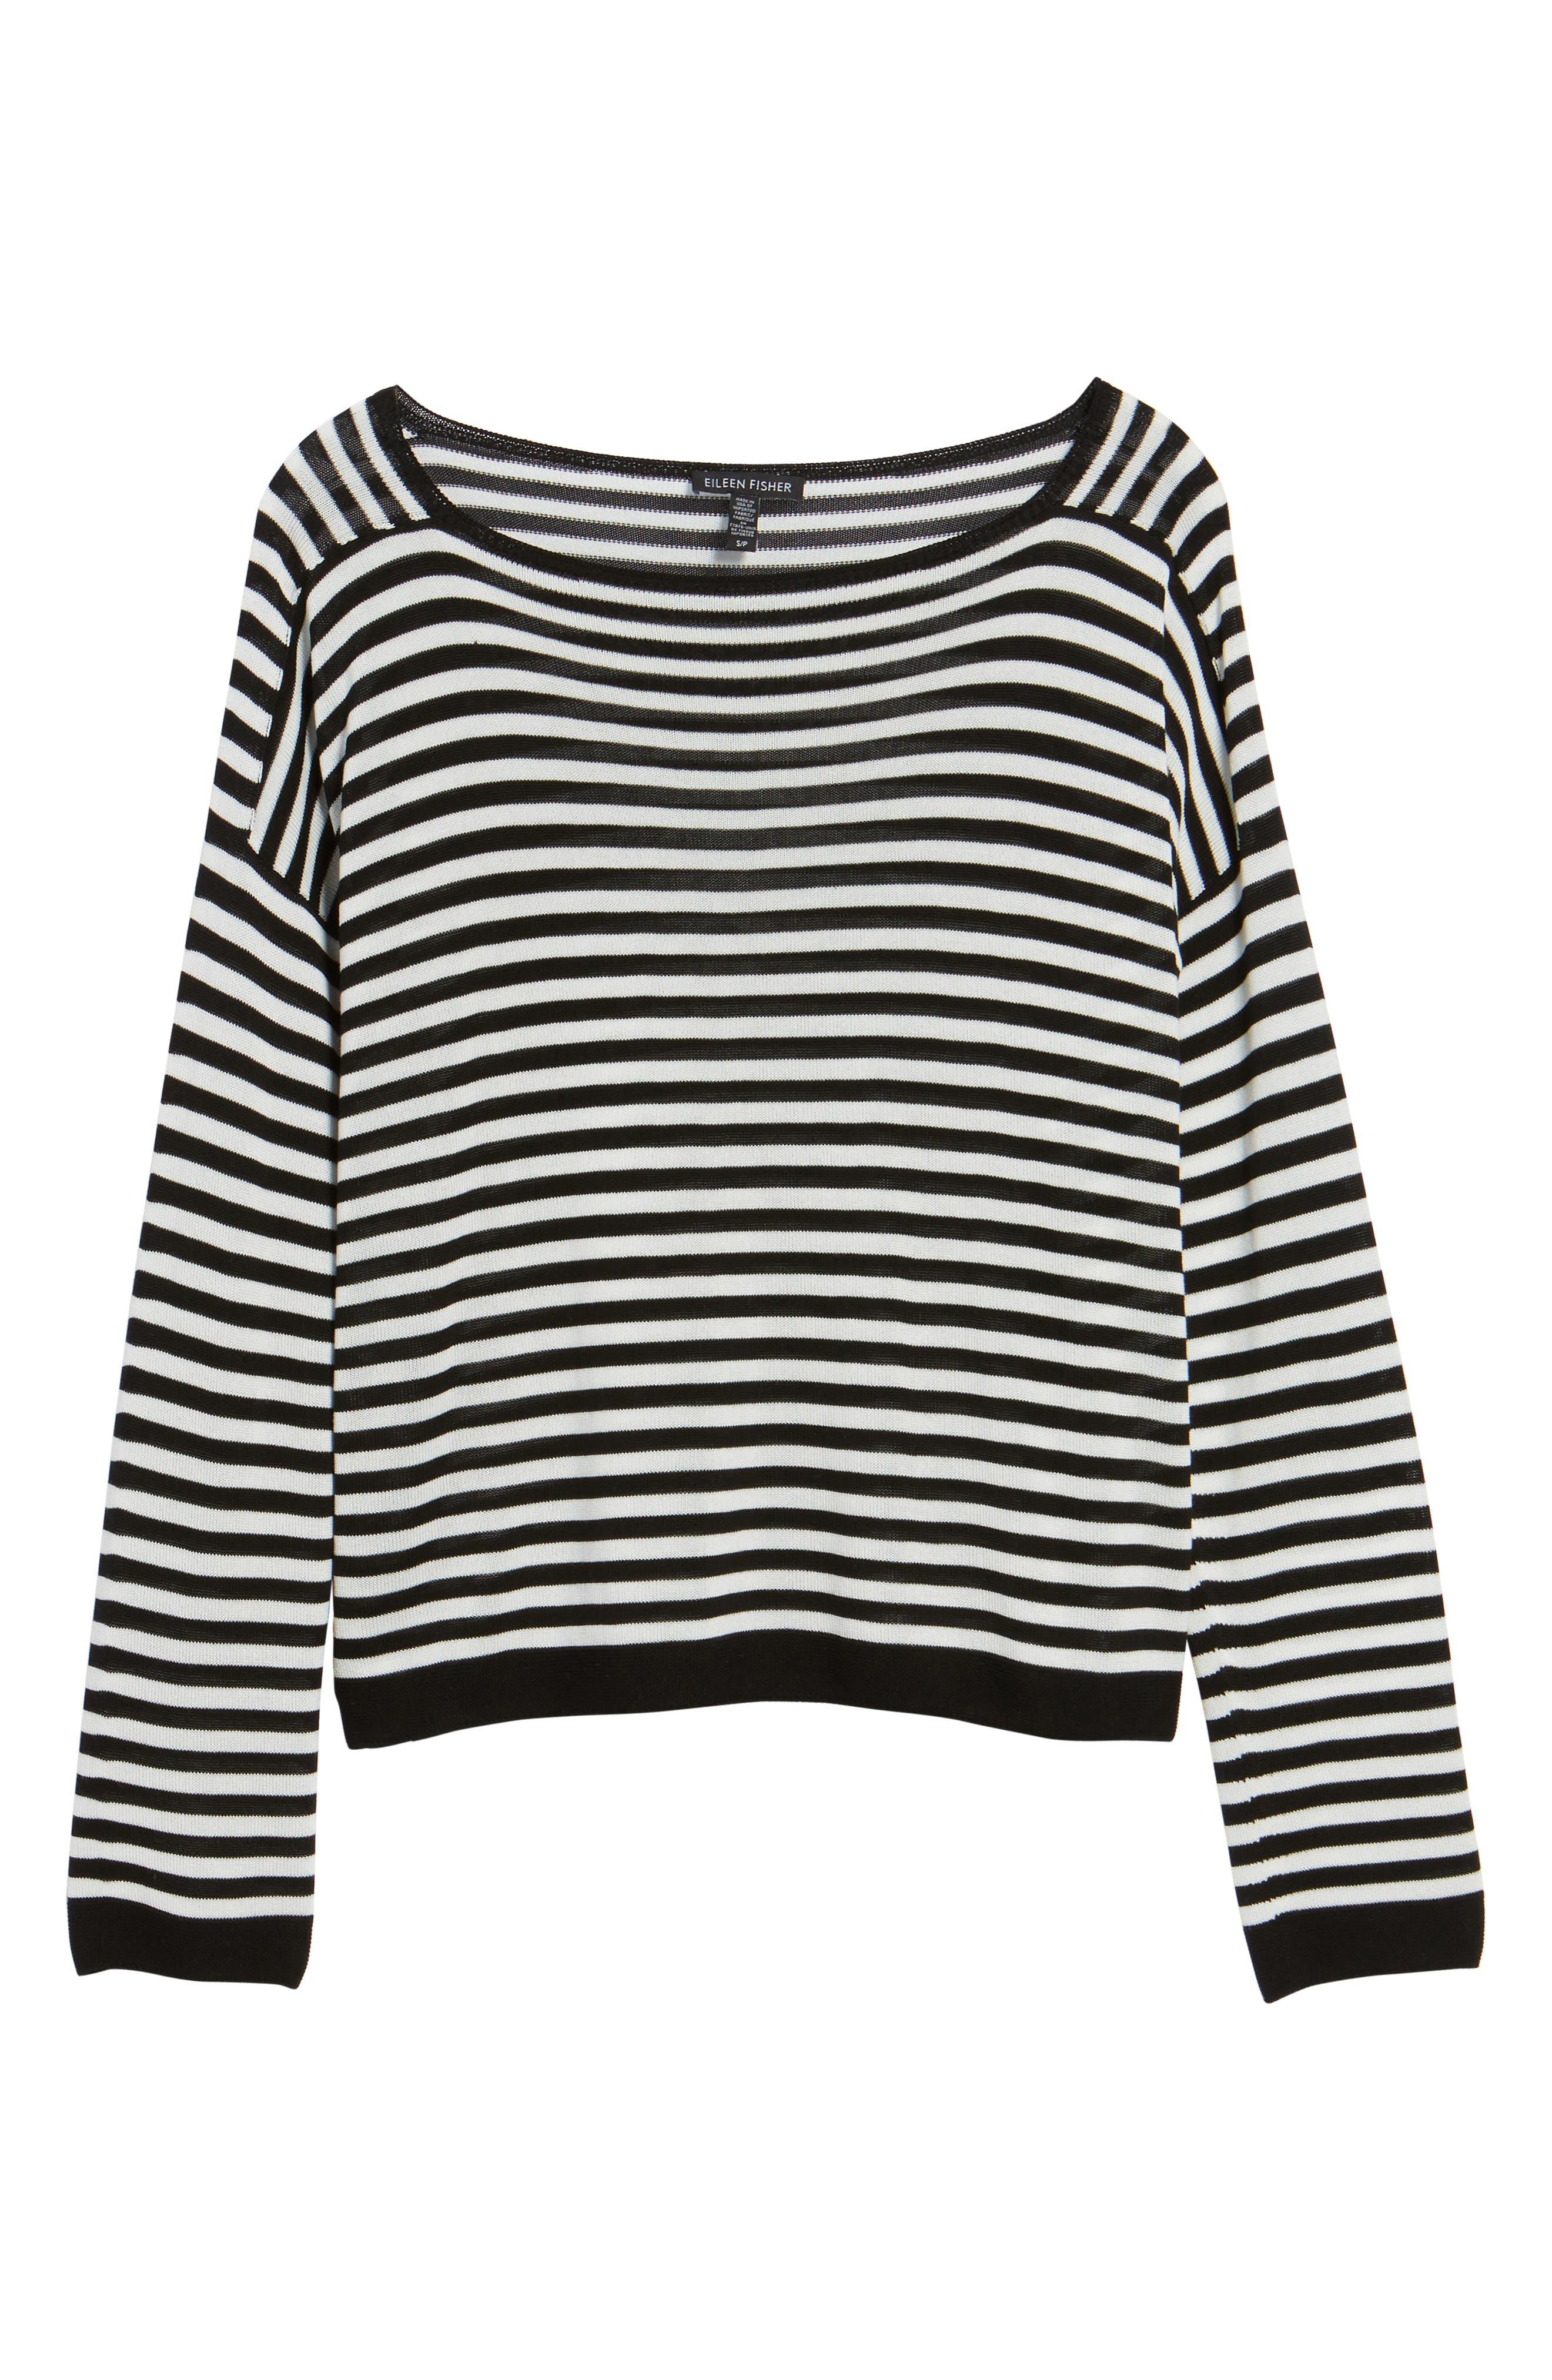 Stripe Tencel<sup>®</sup> Lyocell Knit Sweater,                             Alternate thumbnail 6, color,                             Black/ Soft White